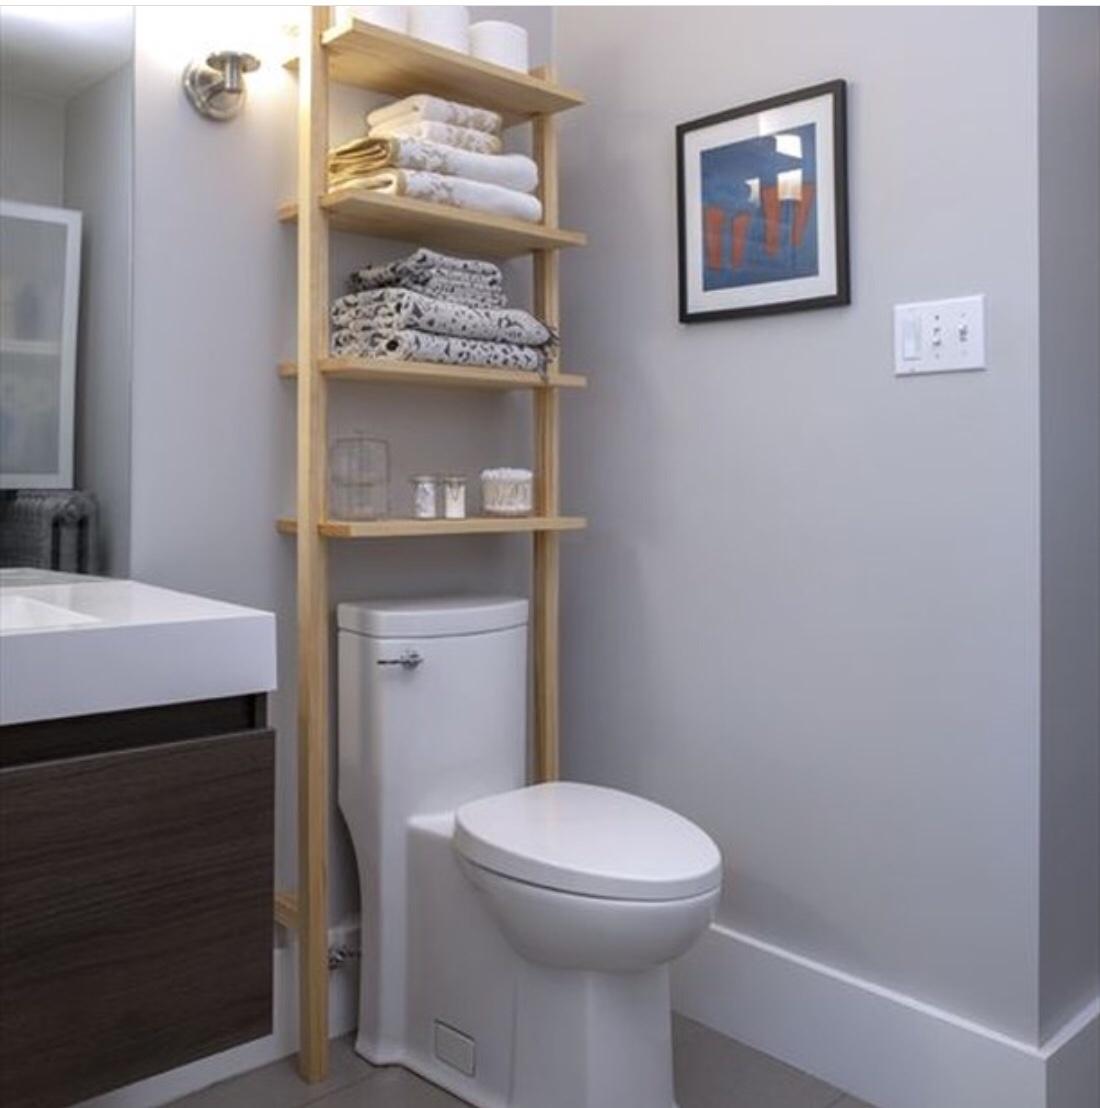 storage on top of toilet